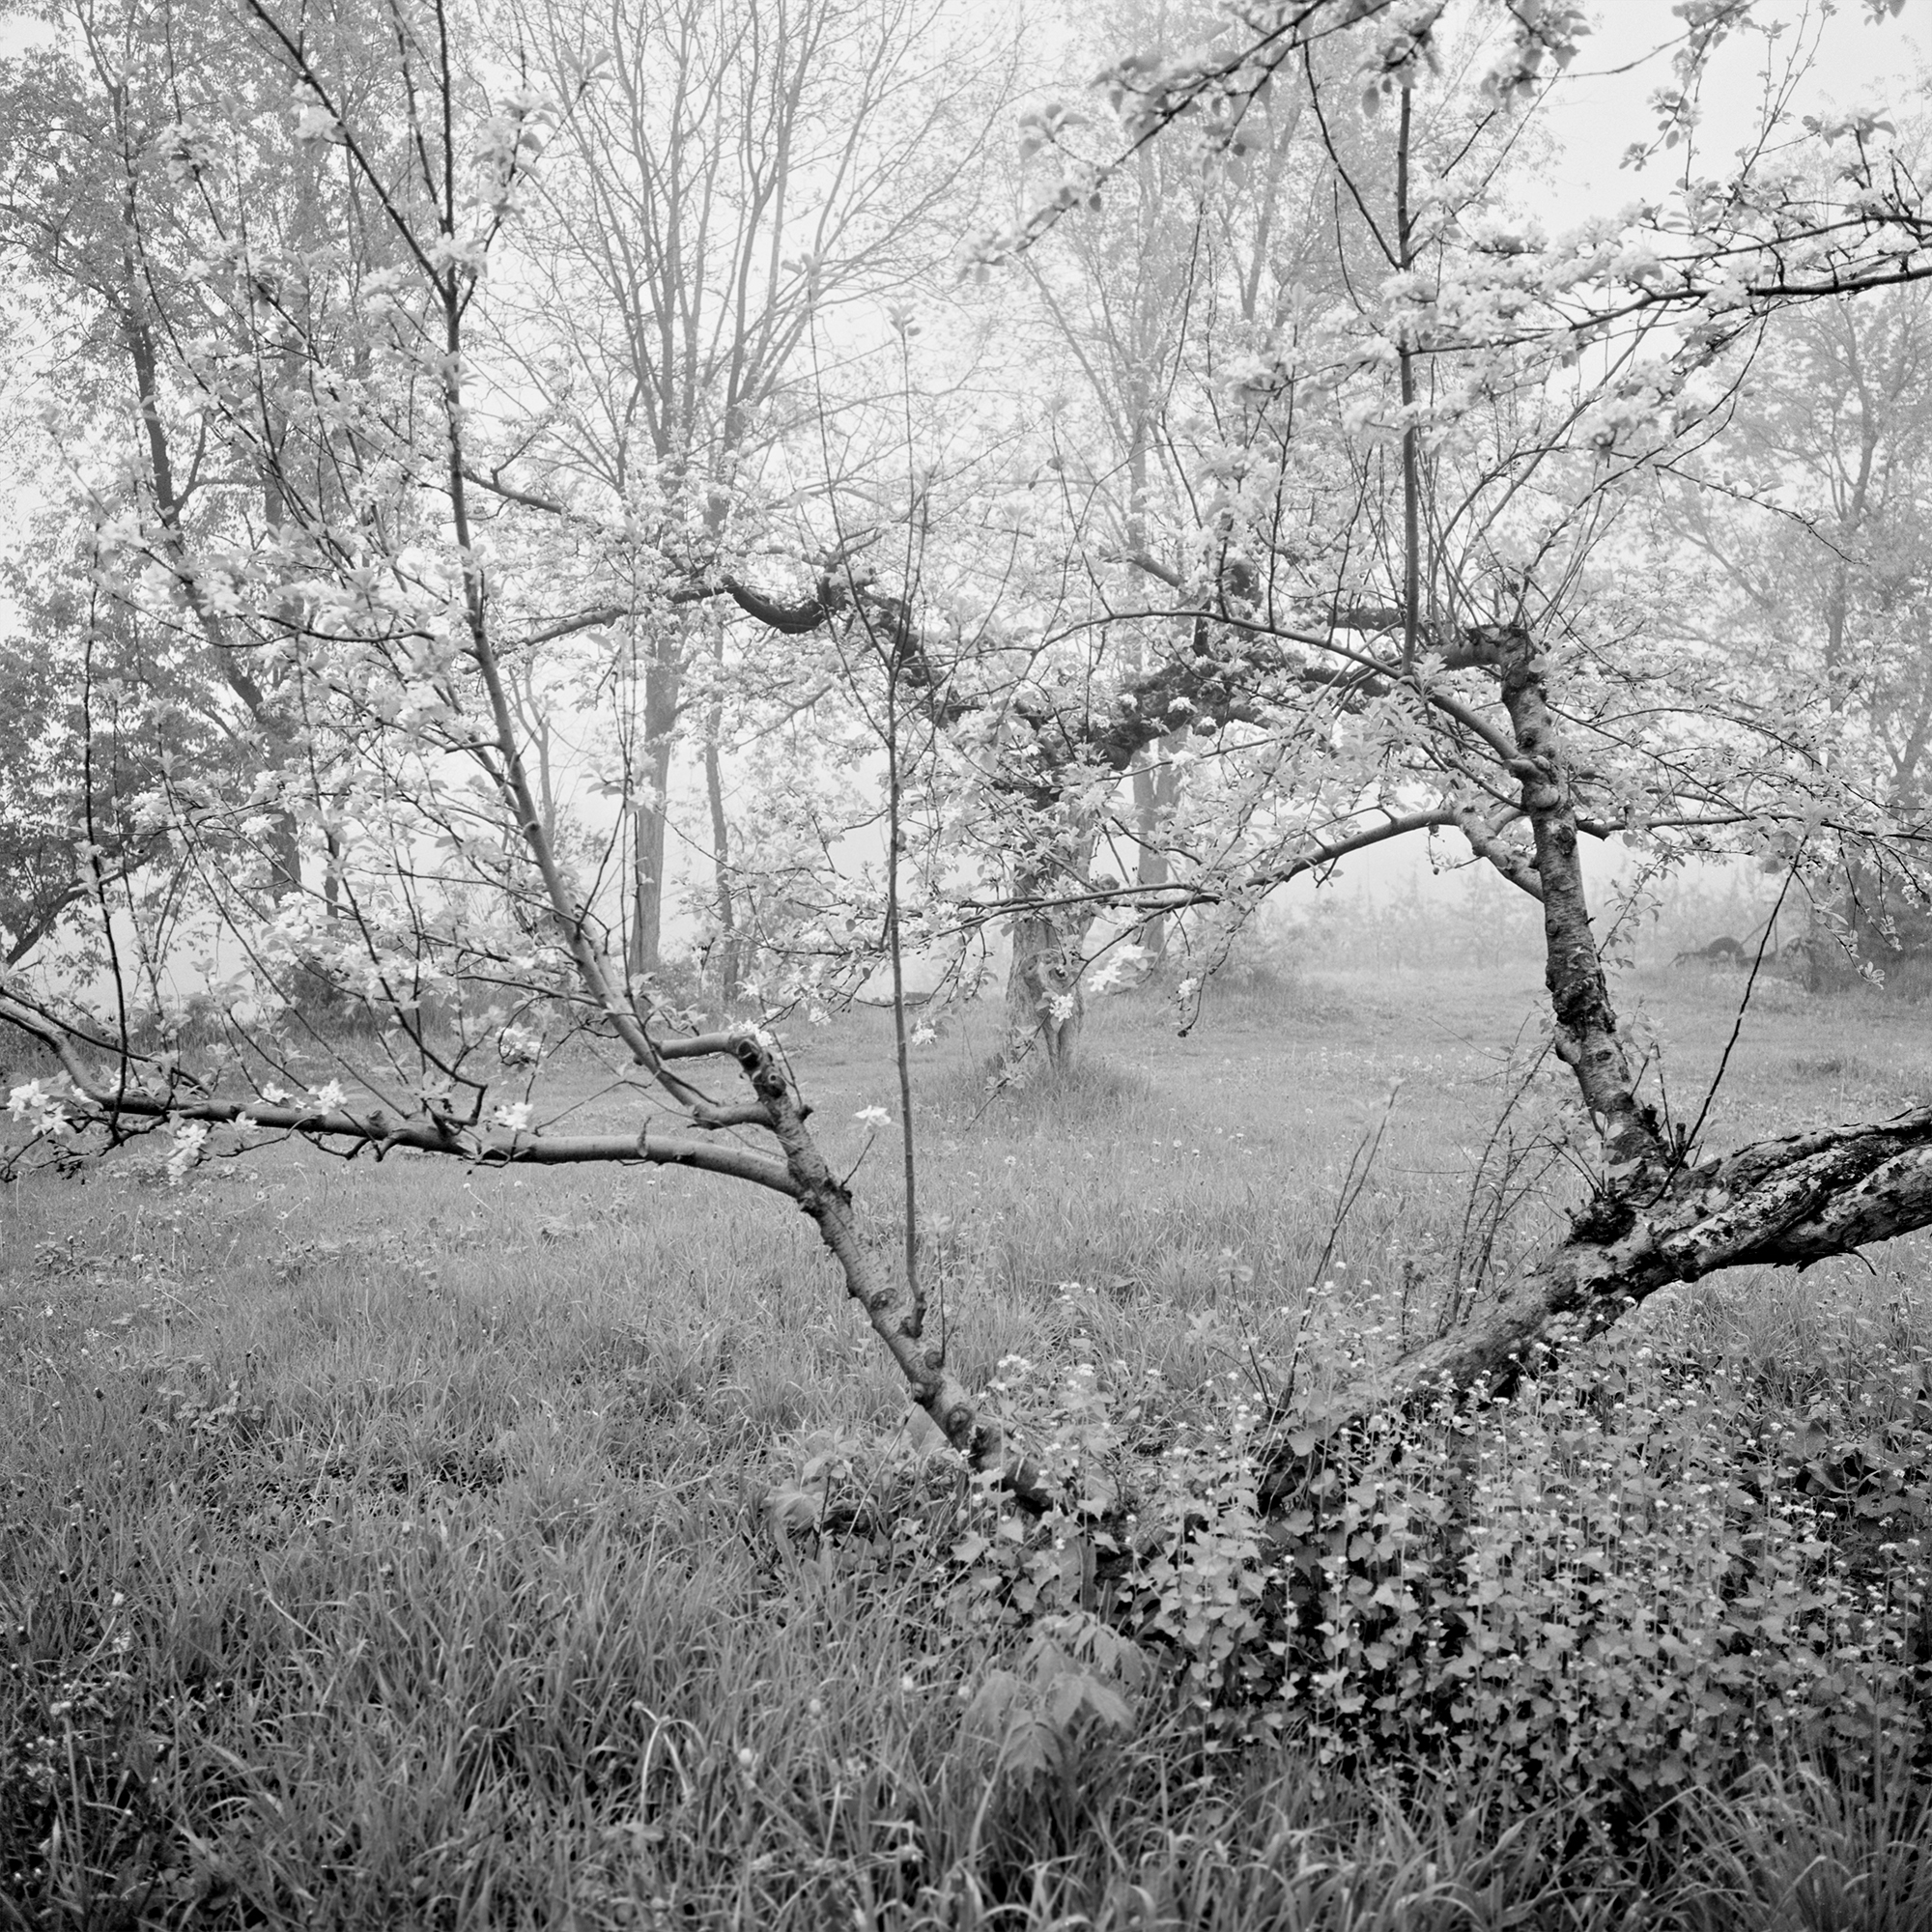 Apple Orchard Wisconsin 2000 -Arthur Lazar